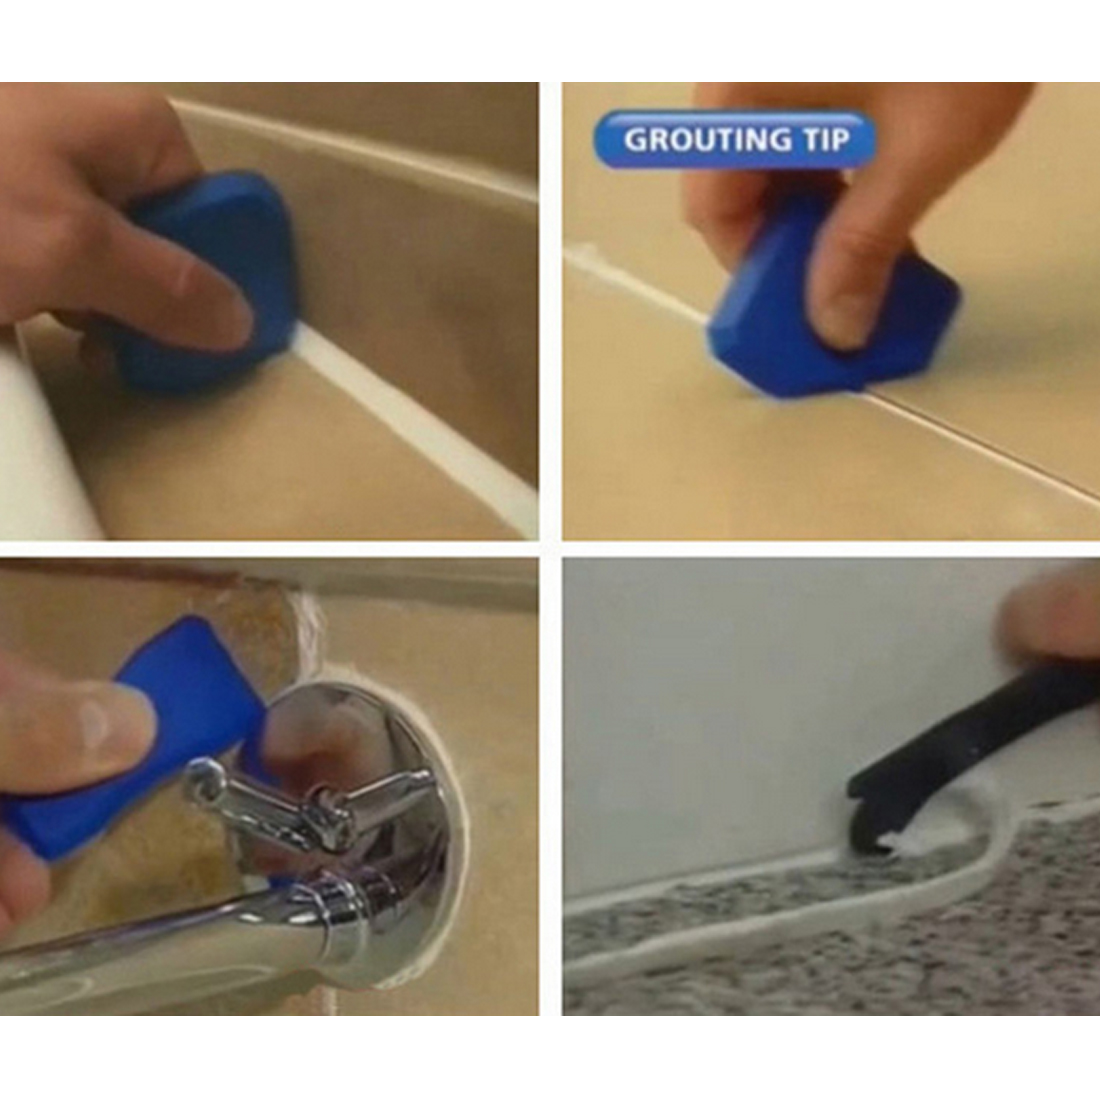 Купить с кэшбэком Professional Caulking Tool Kit Joint Sealant Silicone Grout Remover Scraper Home & Garden Tool Kit Hand Tools